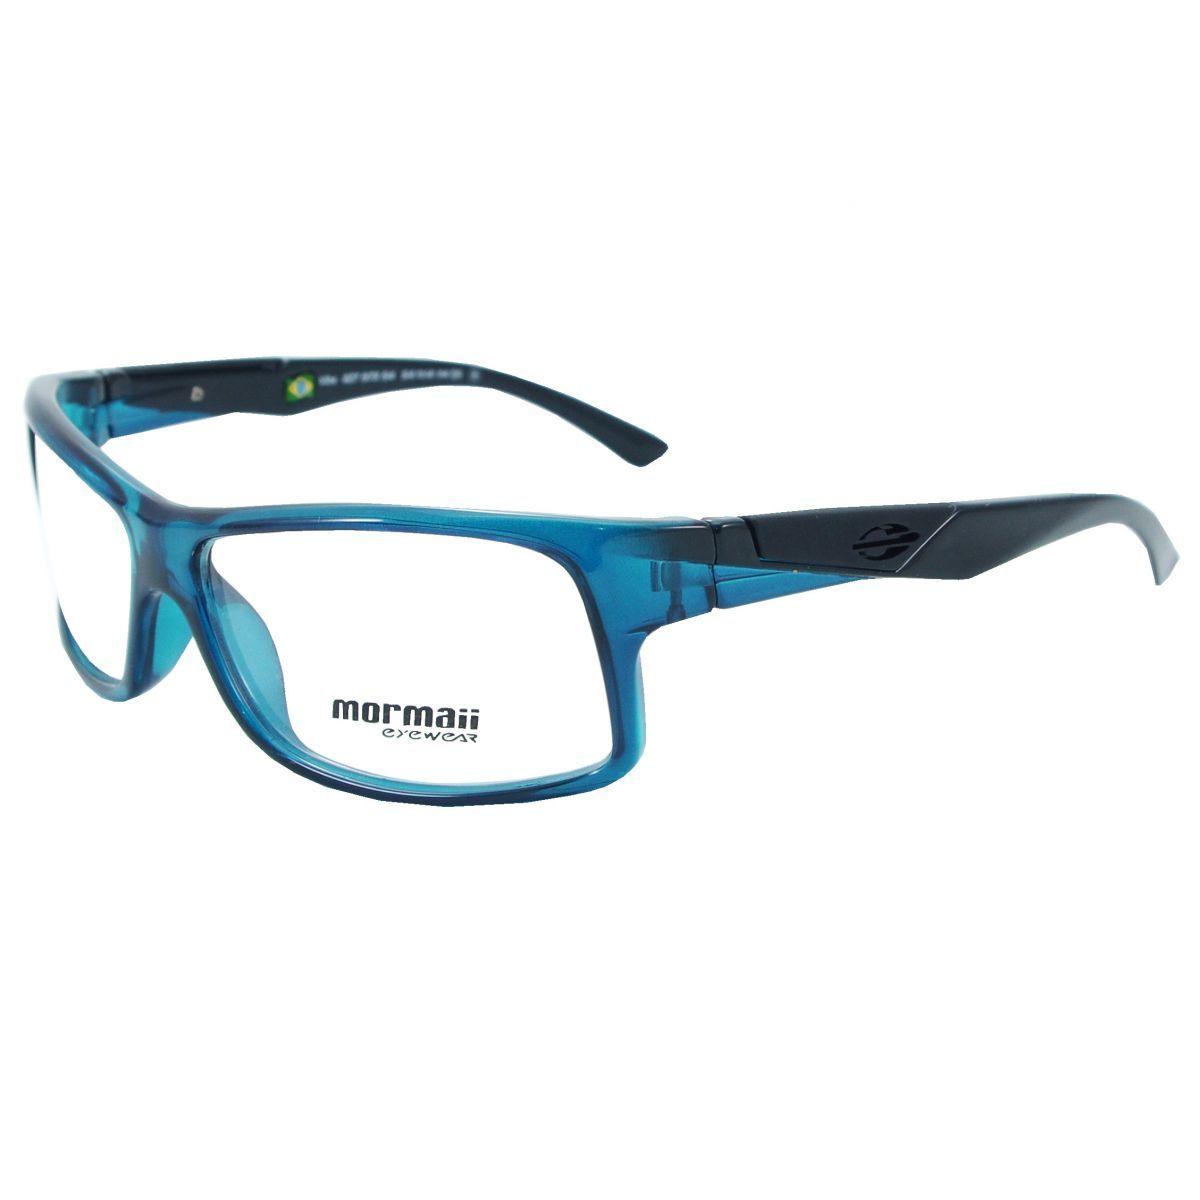 422d76997852d Óculos De Grau Masculino Mormaii Vibe 1127 973 Tam.54   Óculos ...